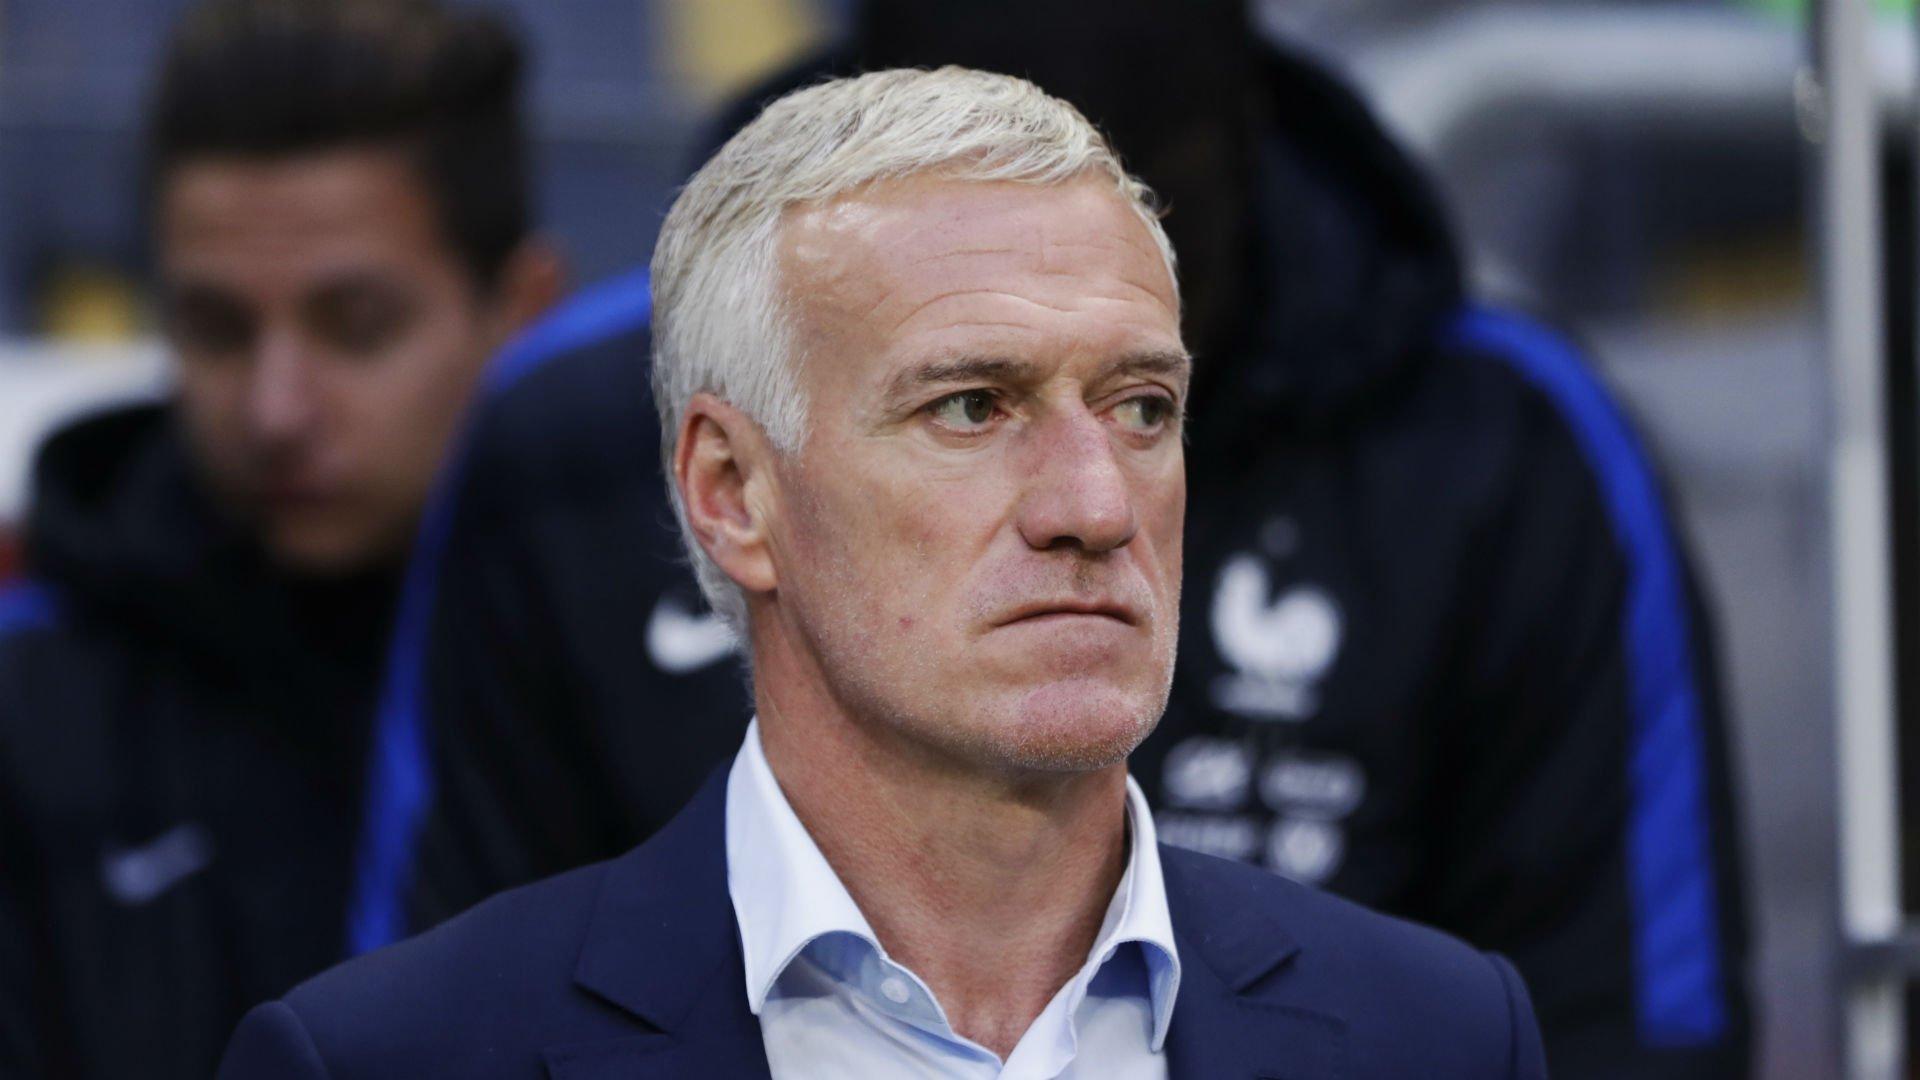 Euro 2020: You failed as Tottenham manager – Deschamps hits back at Mourinho